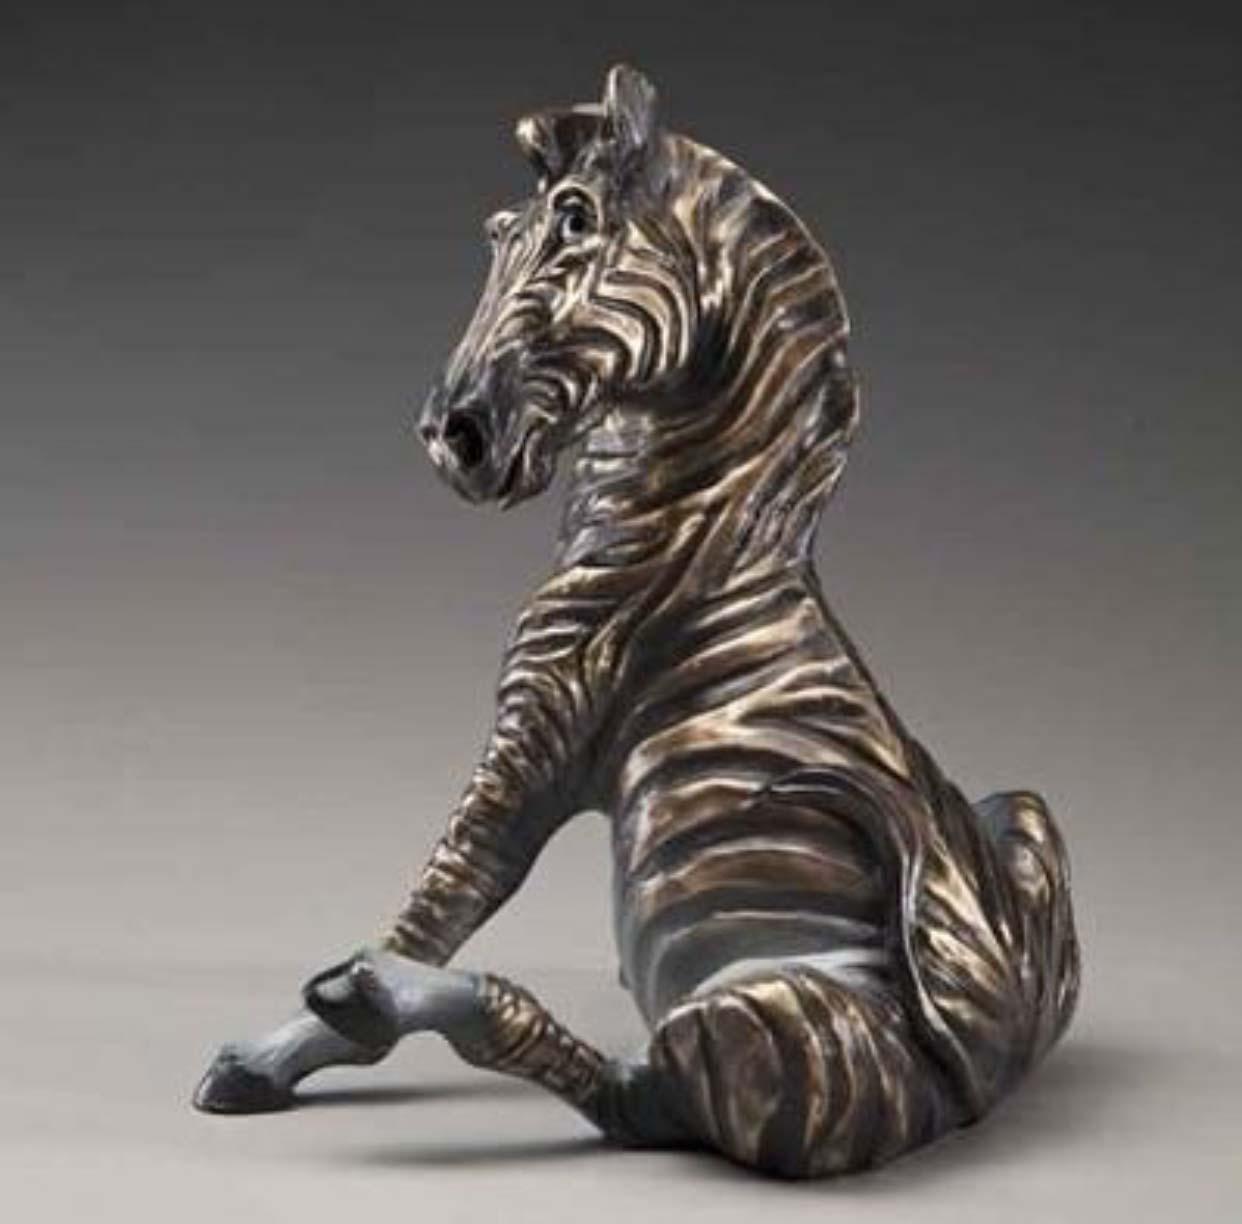 Life Size Park Animal Decoration Bronze zebra statue